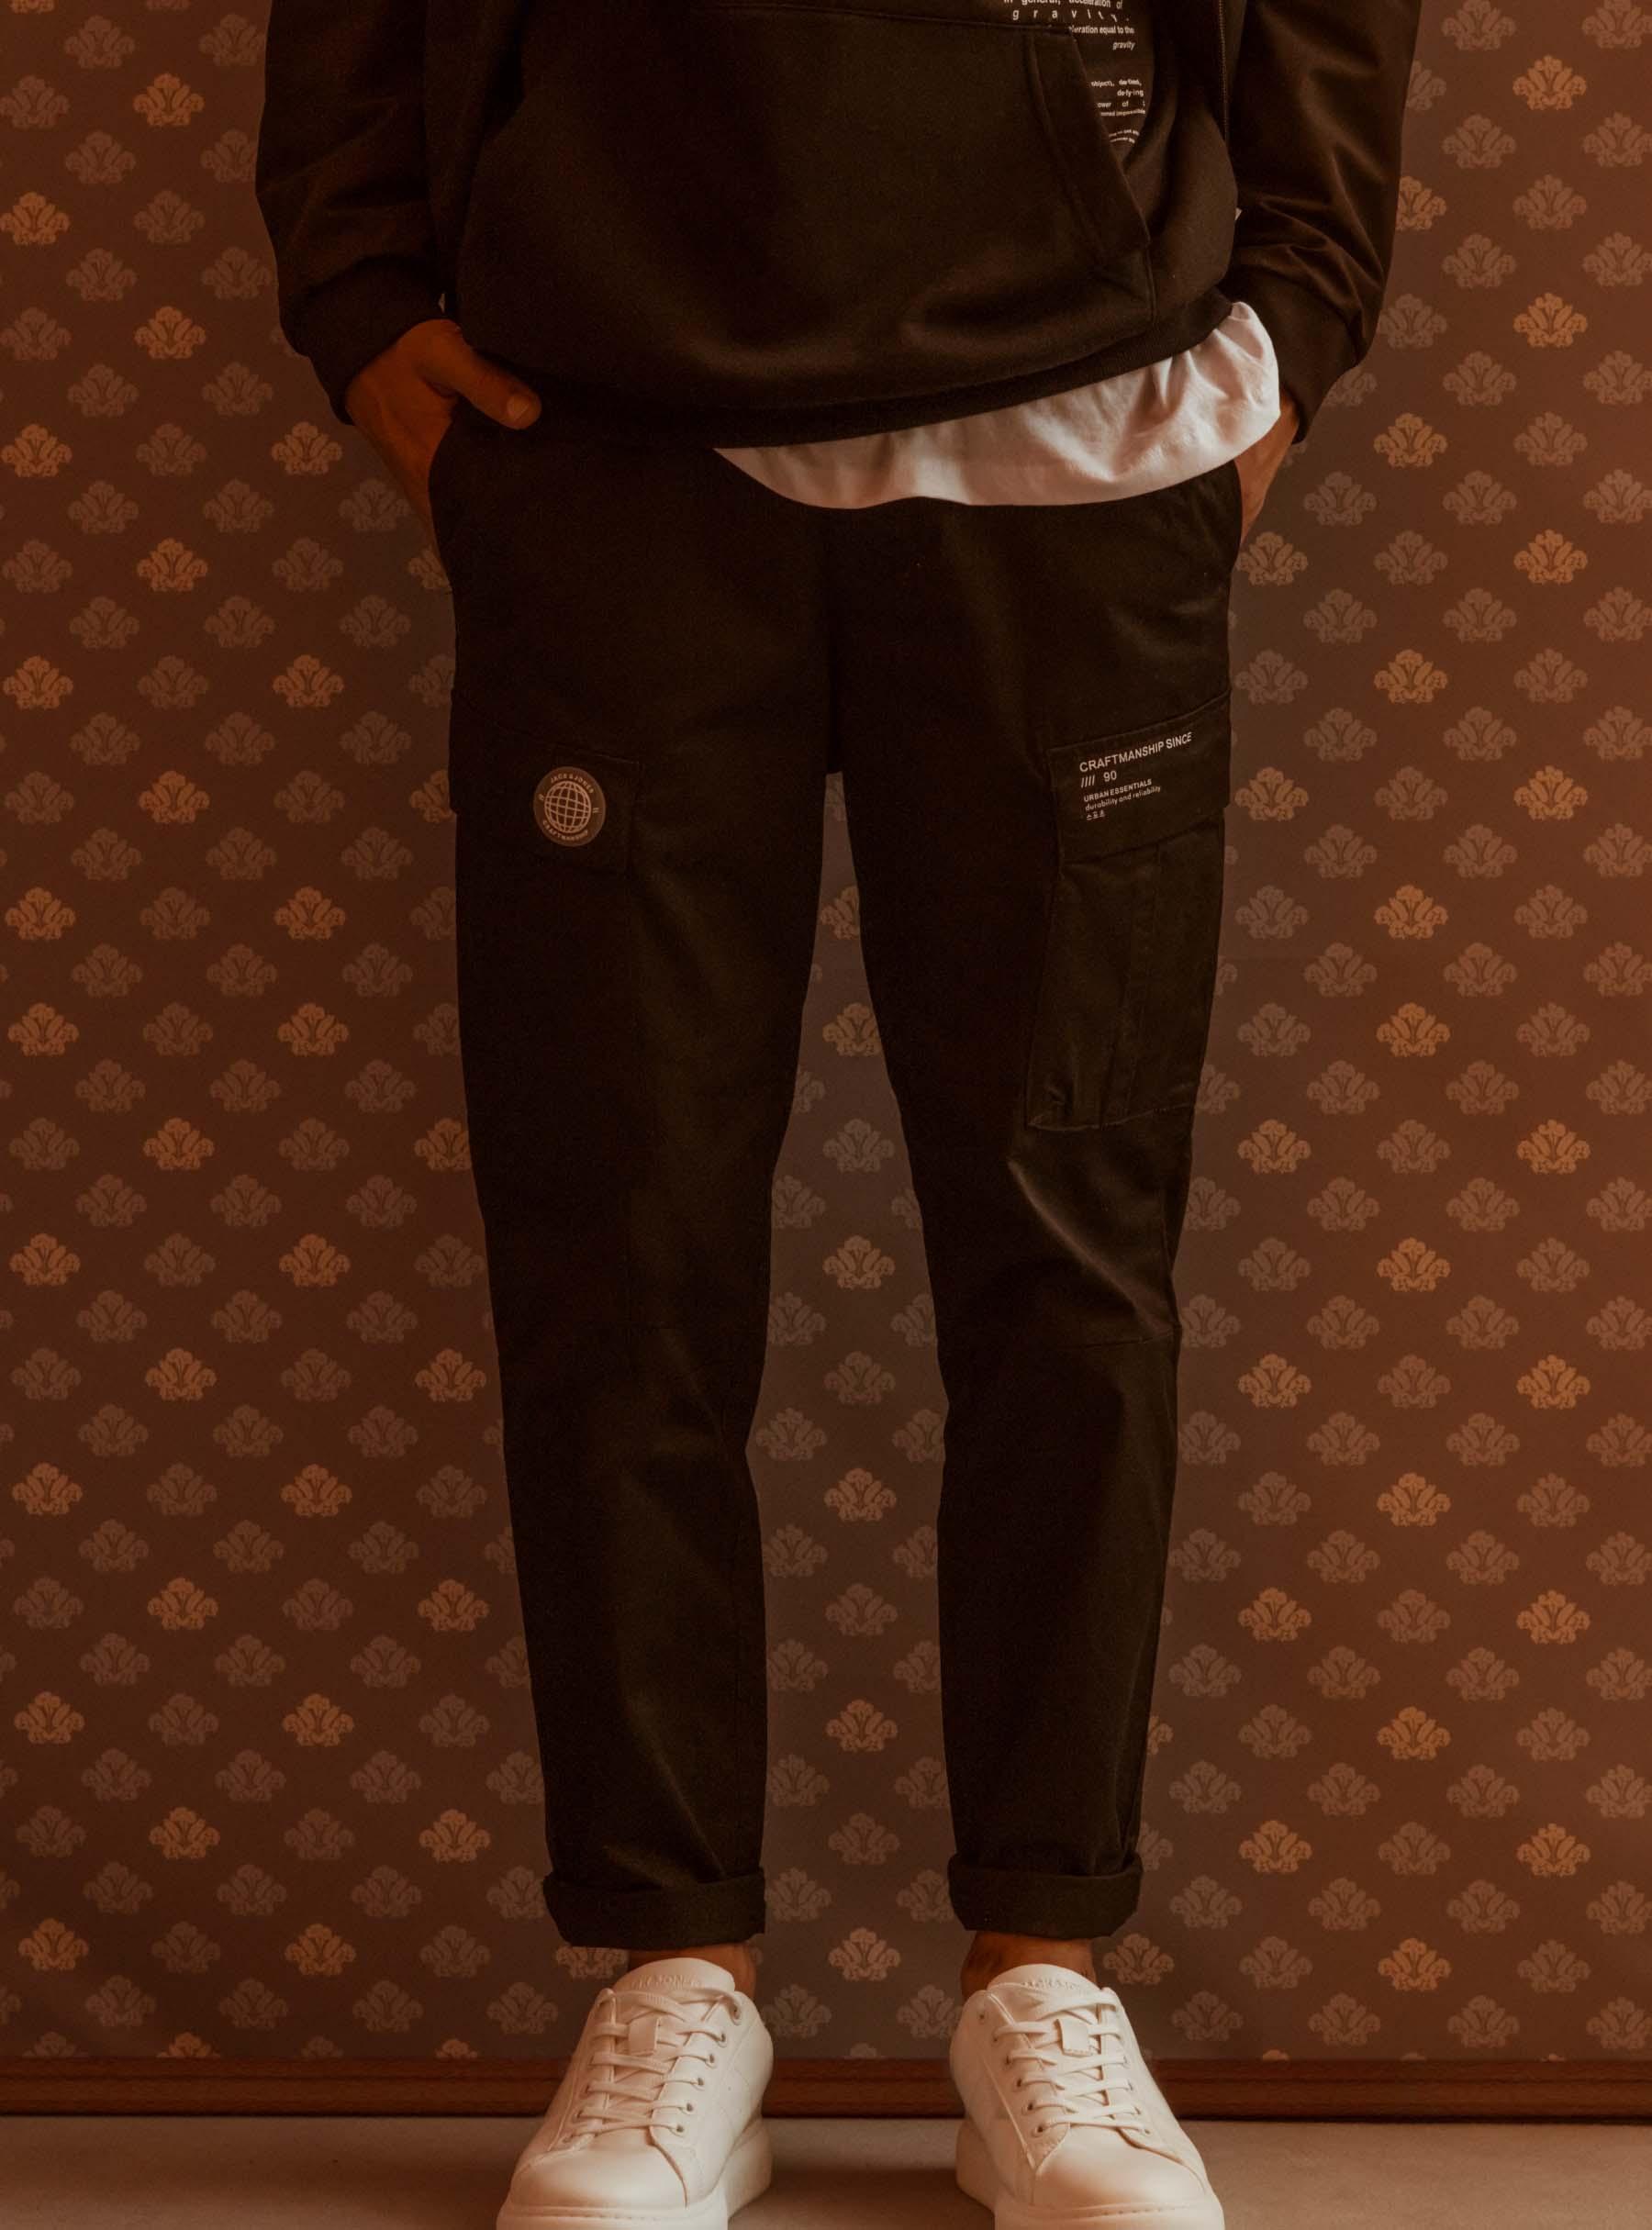 Jack & Jones hlače 59,99 €